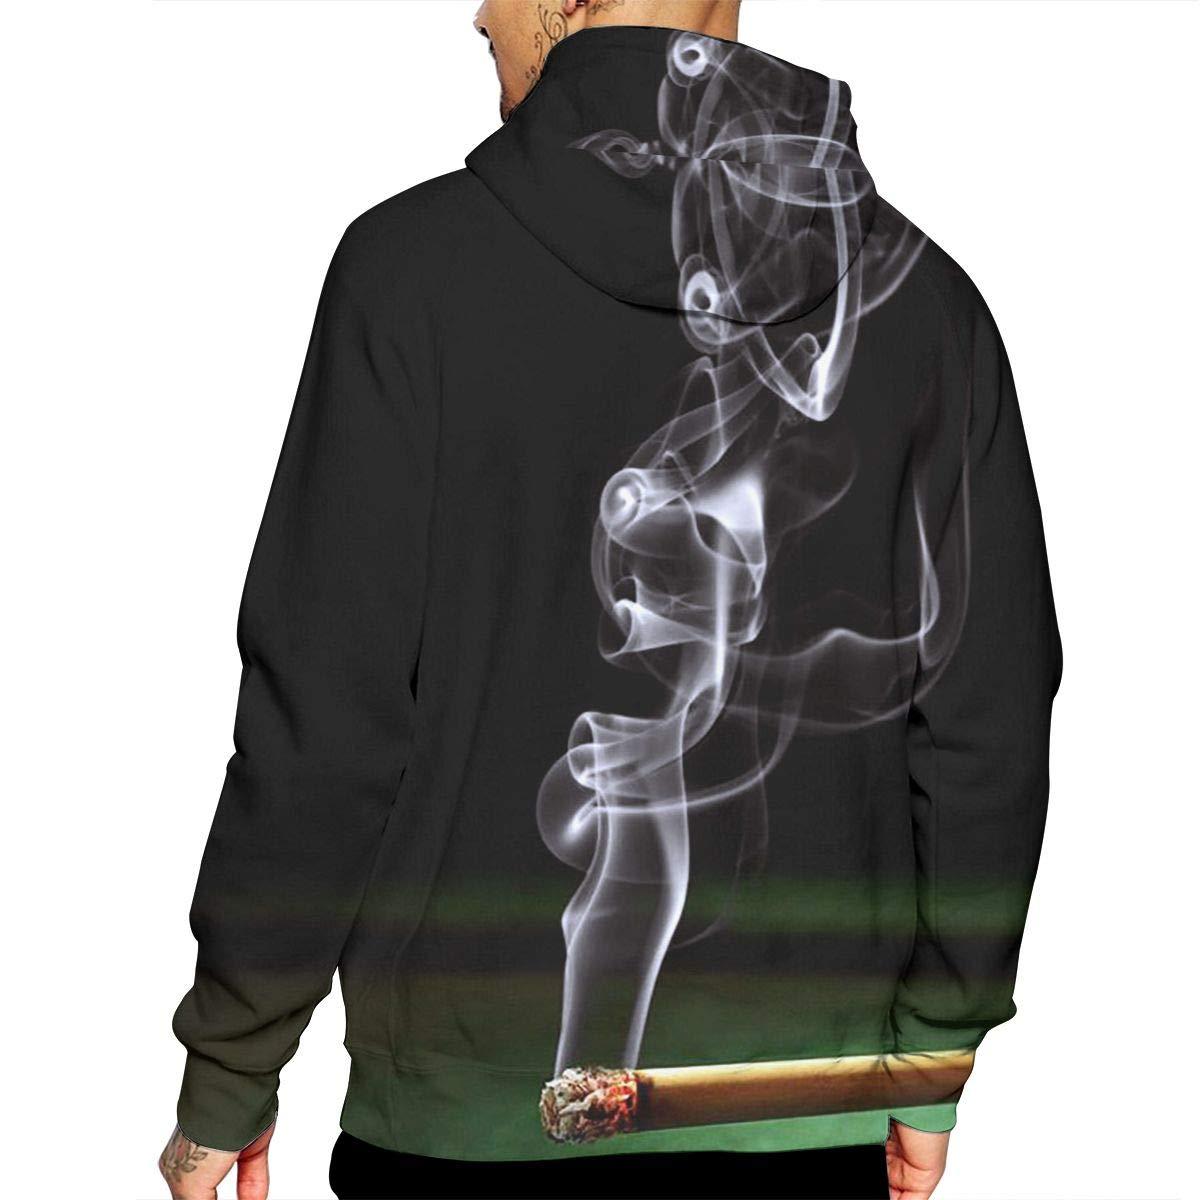 Pullover Hoodie Billiard Fleece Hoodies Kangaroo Pocket Sweatshirt Hooded for Men